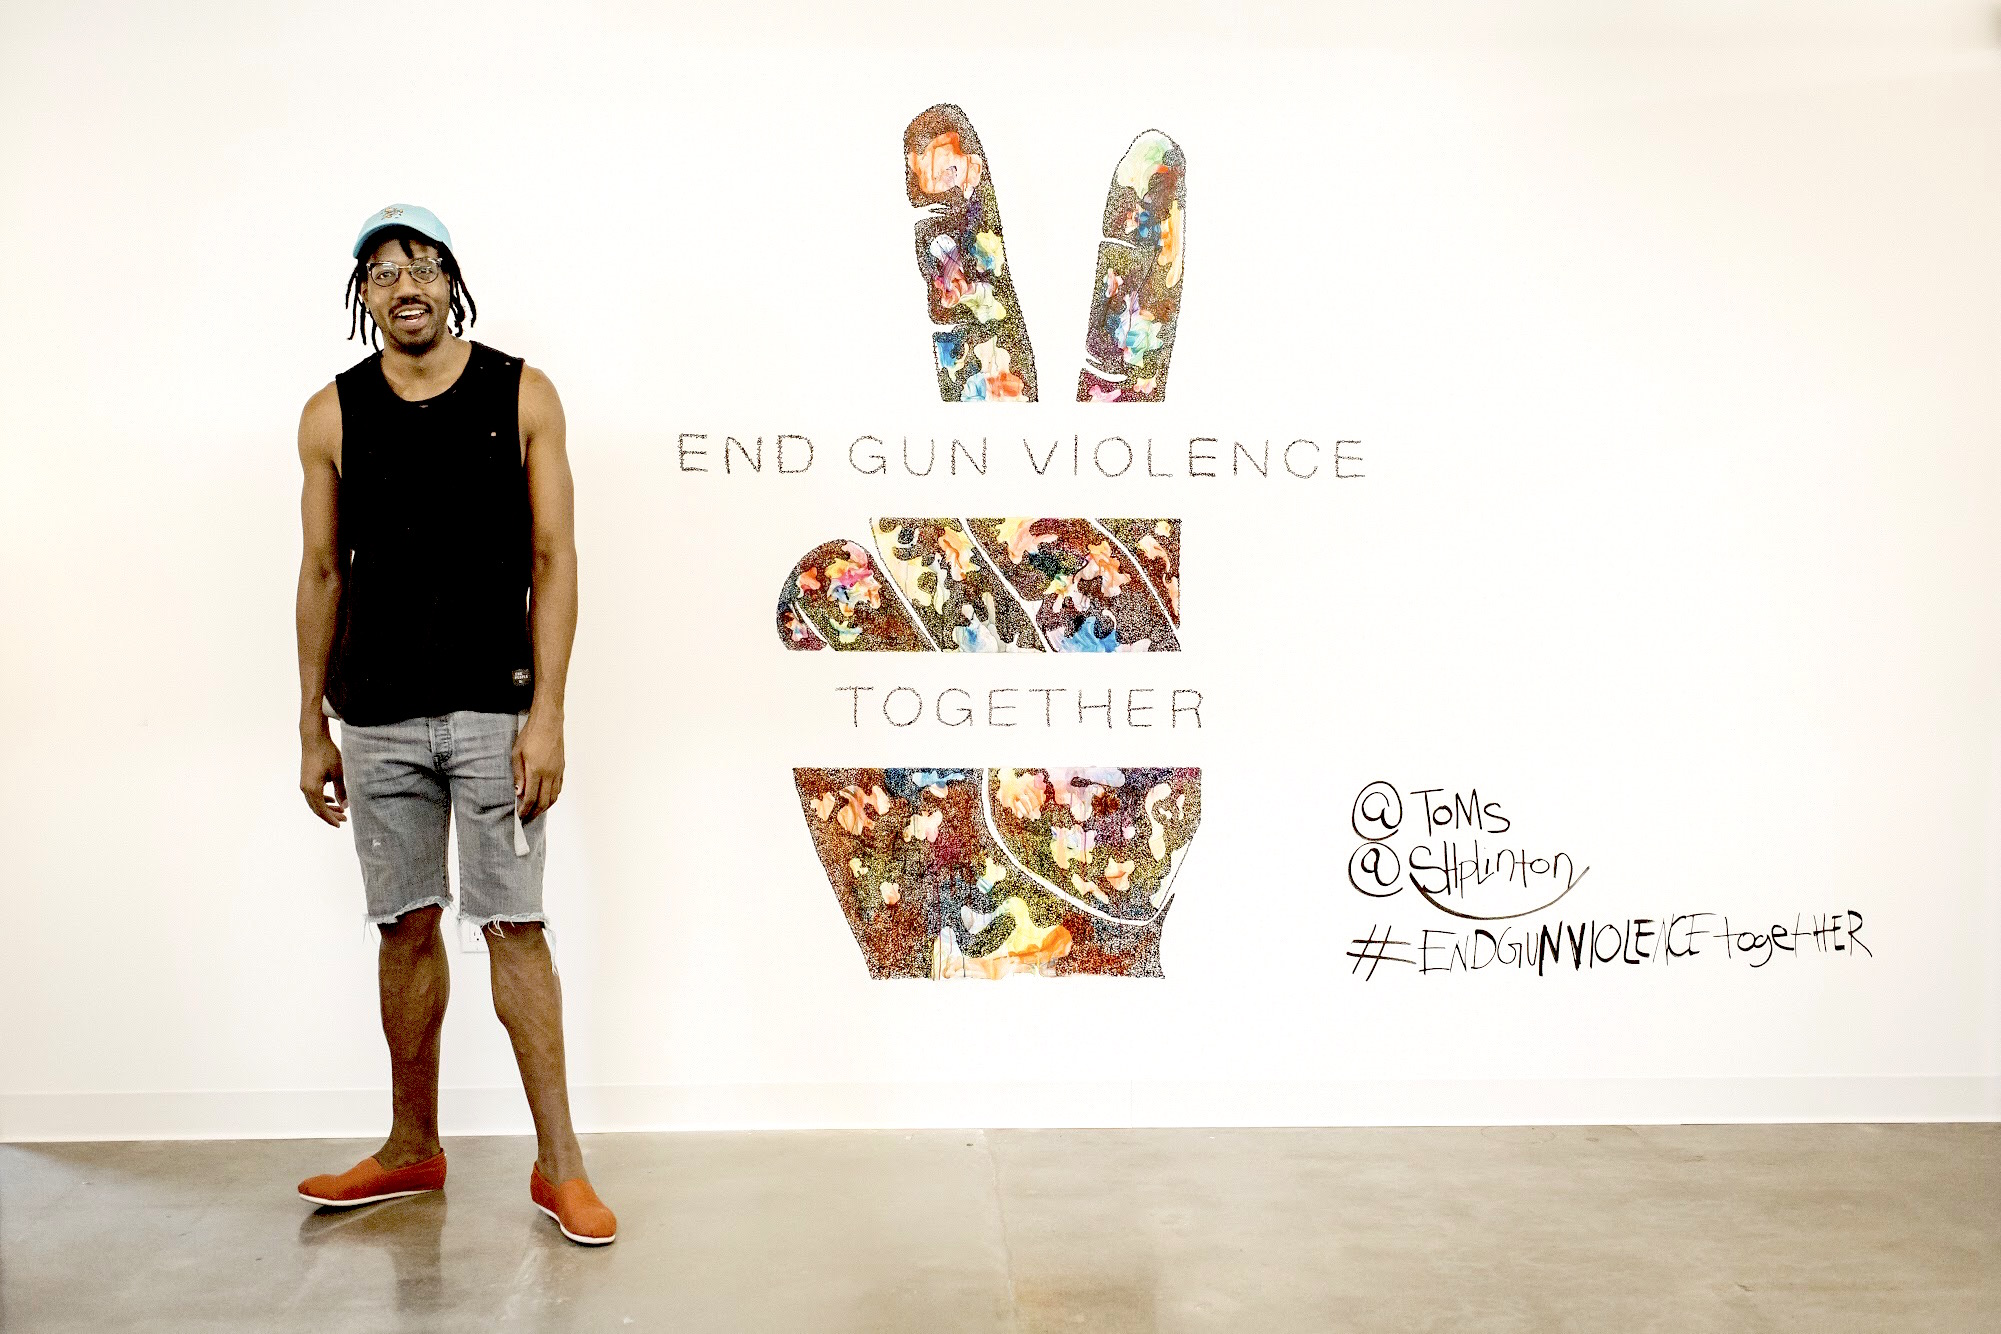 Shplinton with his TOMS #EndGunViolenceTogether mural